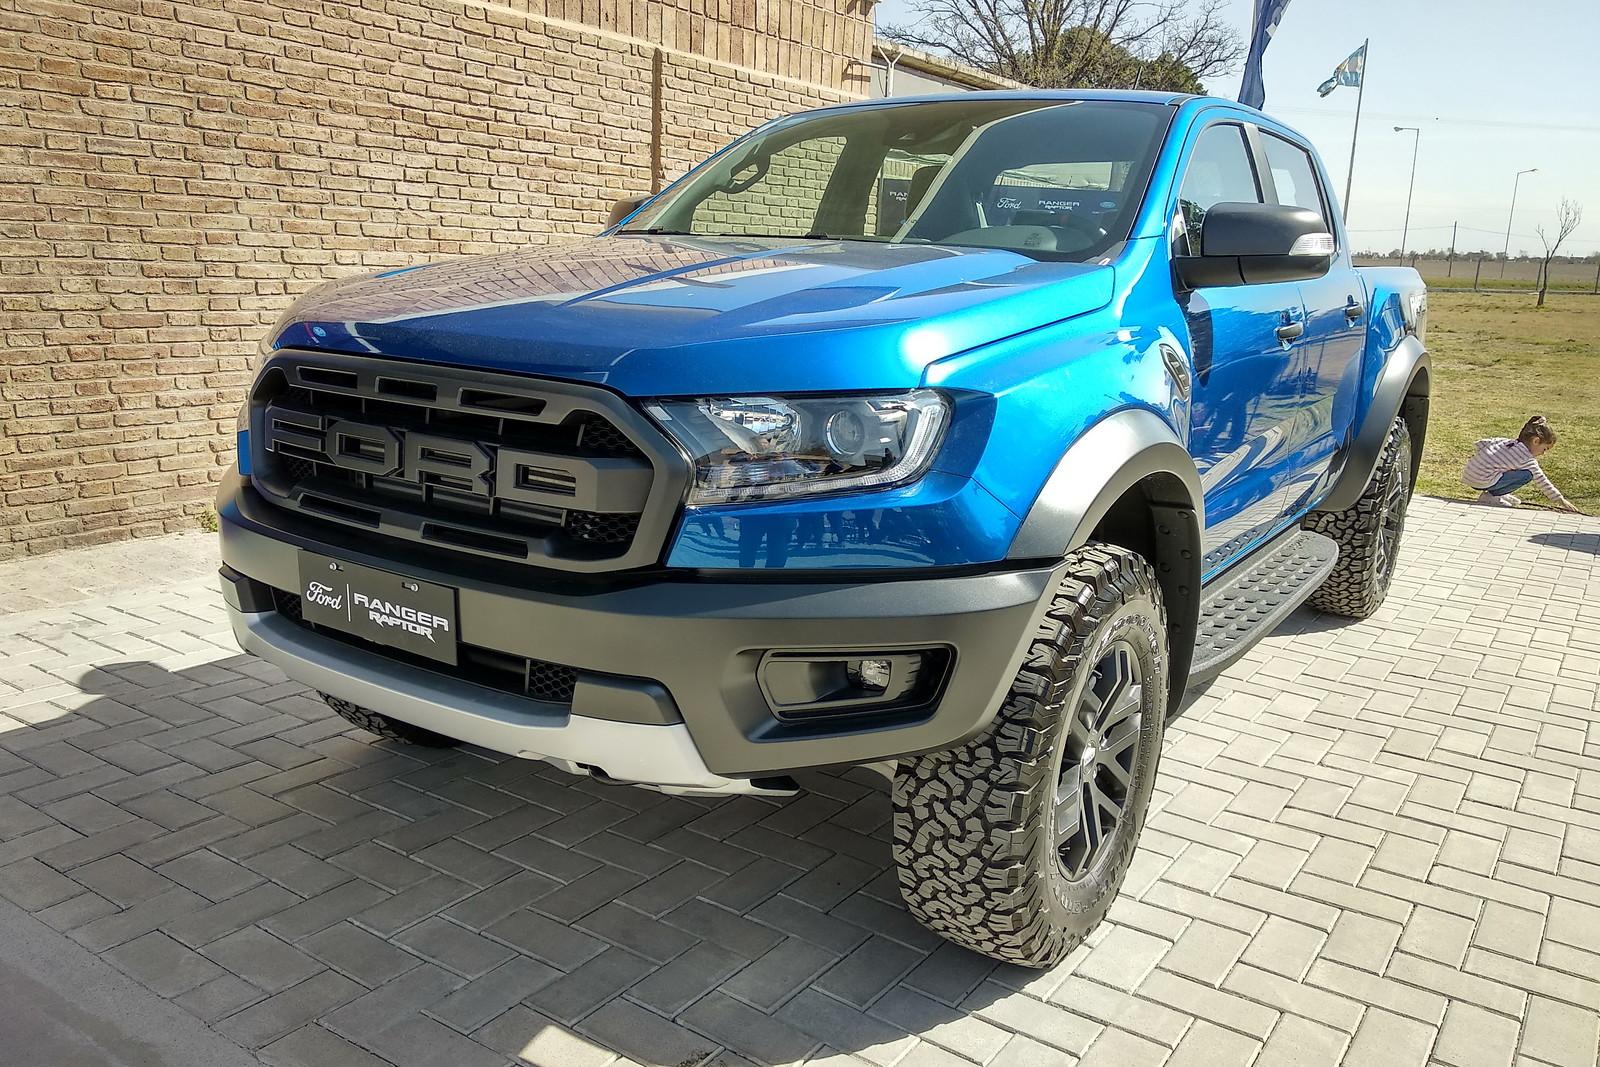 Carsdrive Cordoba Una Pickup De Rally Ford Ya Ofrece La Ranger Raptor En Argentina Carsdrive Cordoba